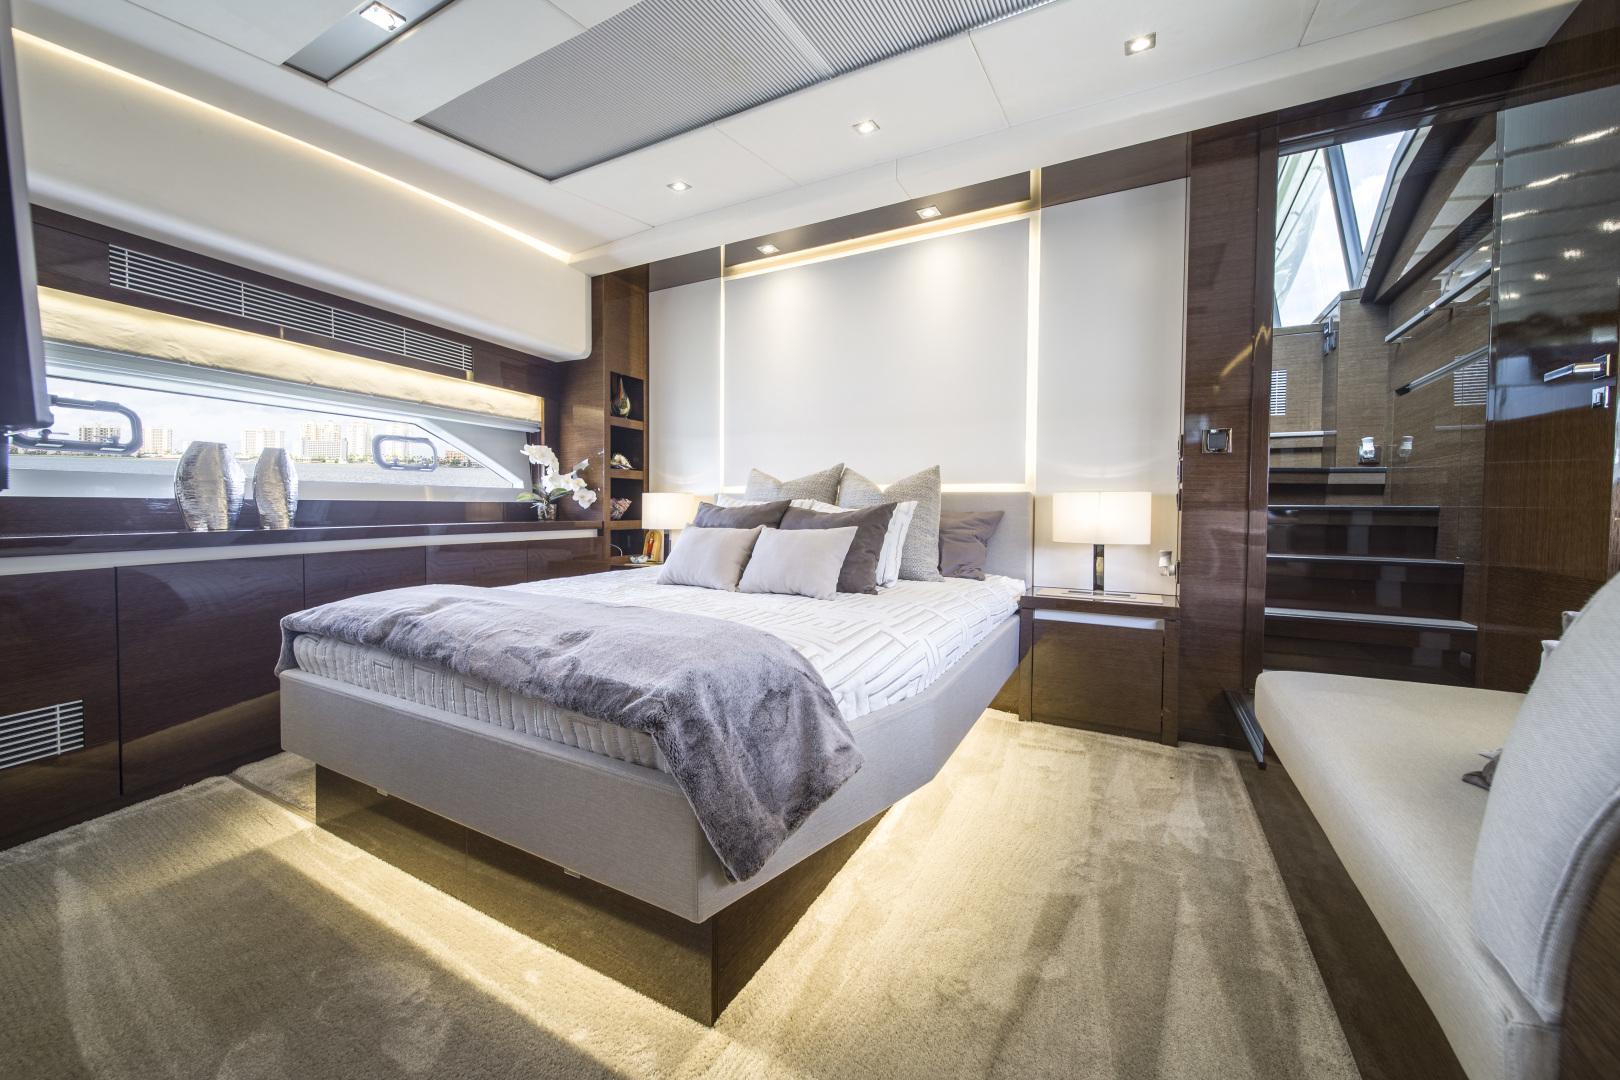 Prestige-680 Flybridge 2018-Seduction Sarasota-Florida-United States-2018 68 Prestige 680 Flybridge  Master Stateroom-1498929 | Thumbnail